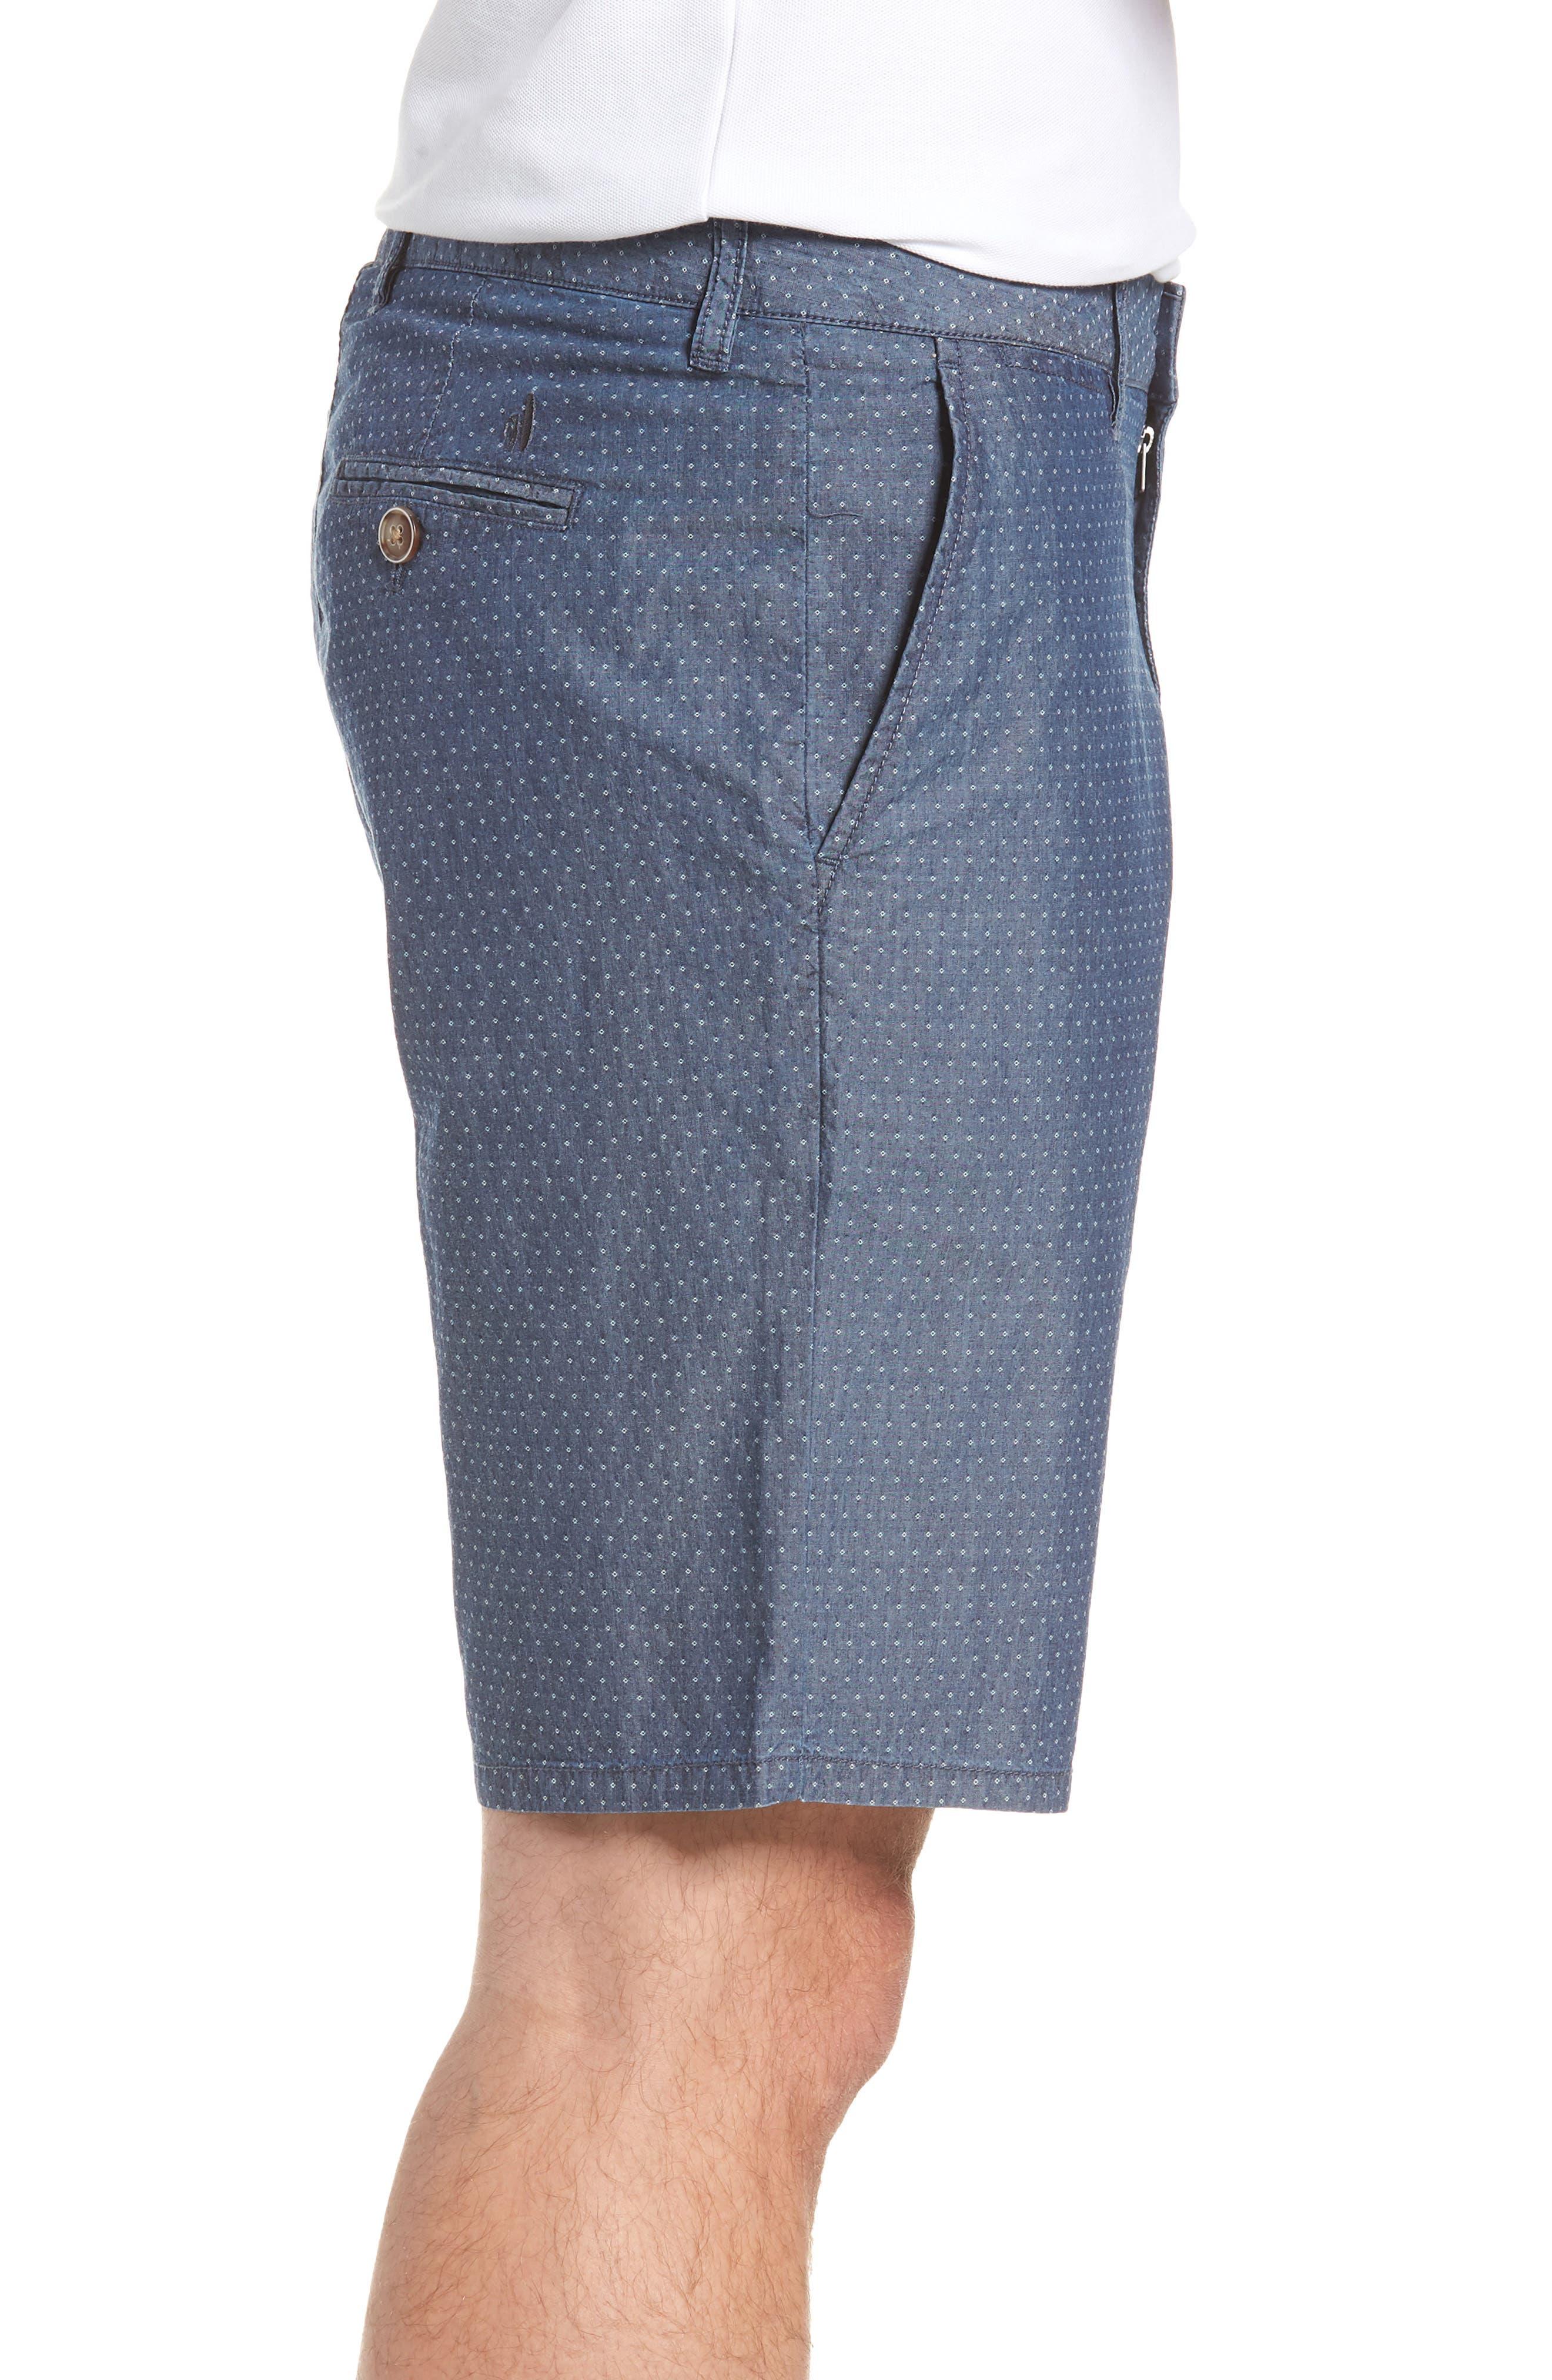 Oliver Classic Fit Chambray Jacquard Shorts,                             Alternate thumbnail 3, color,                             400